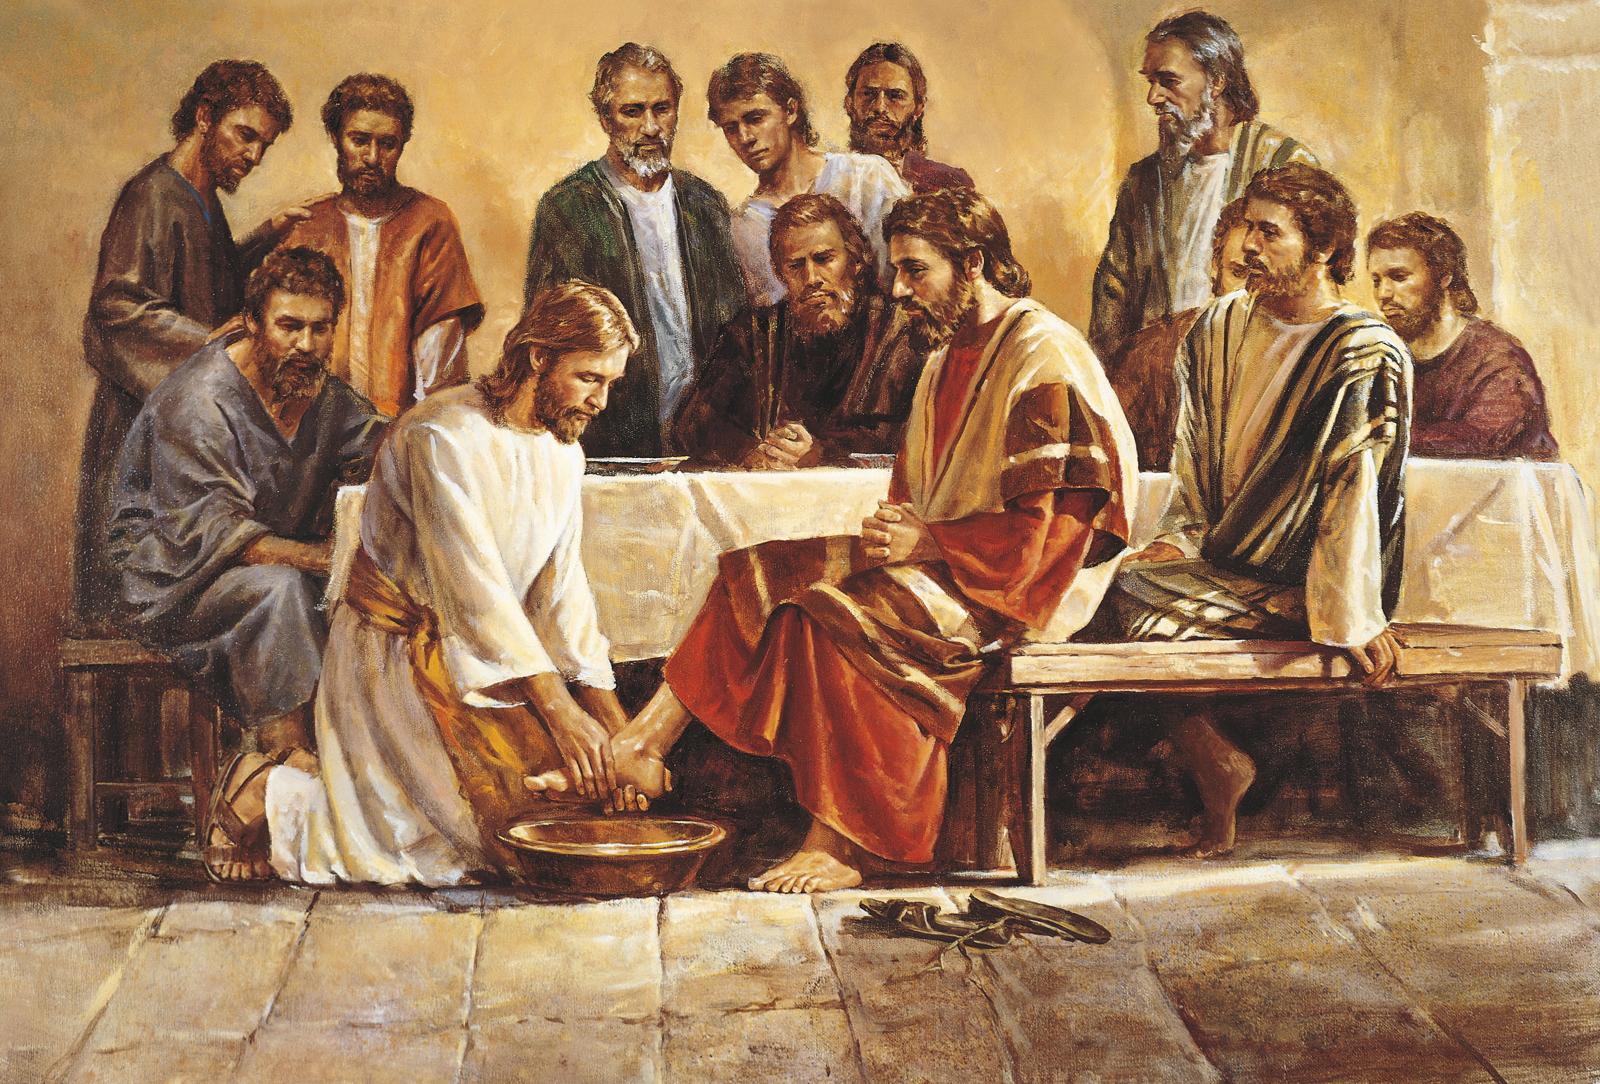 Fr. Tilmann Pesch S.J. (1836-99) Jesus-washing-apostles-feet-39588-print